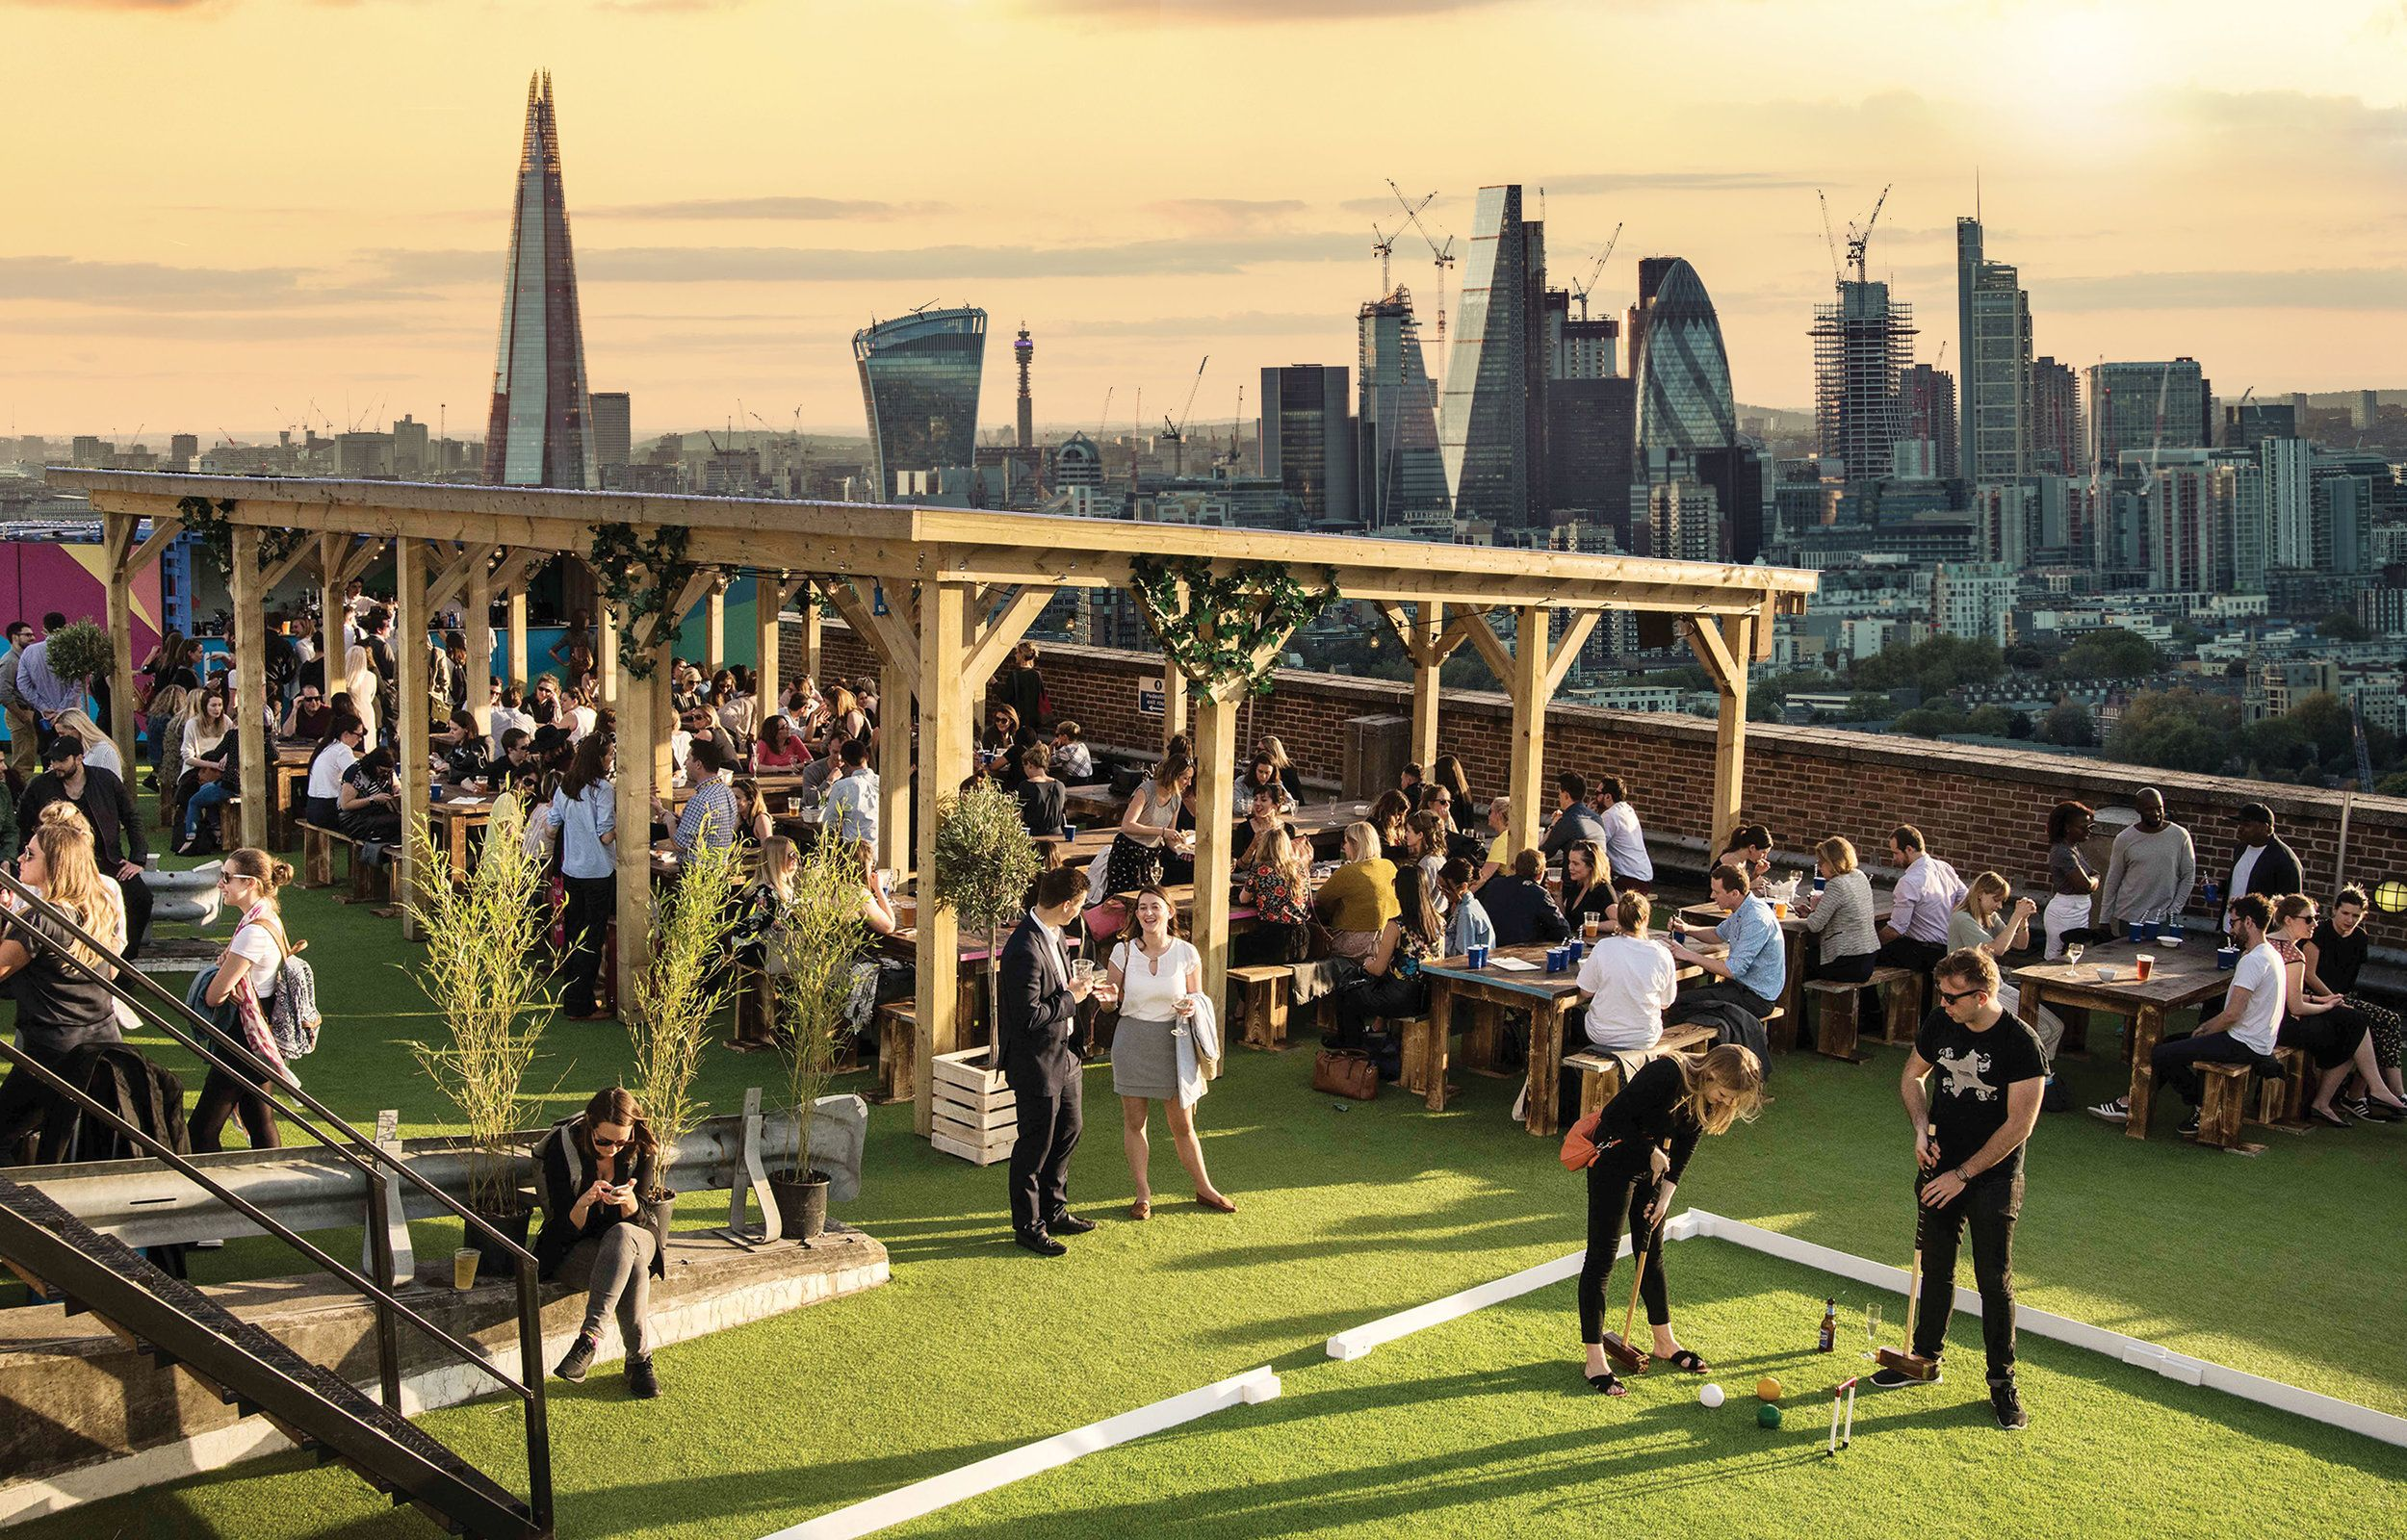 Skylight London Rooftop Bar At Tobacco Dock London Rooftop Bar Best Rooftop Bars London Rooftops